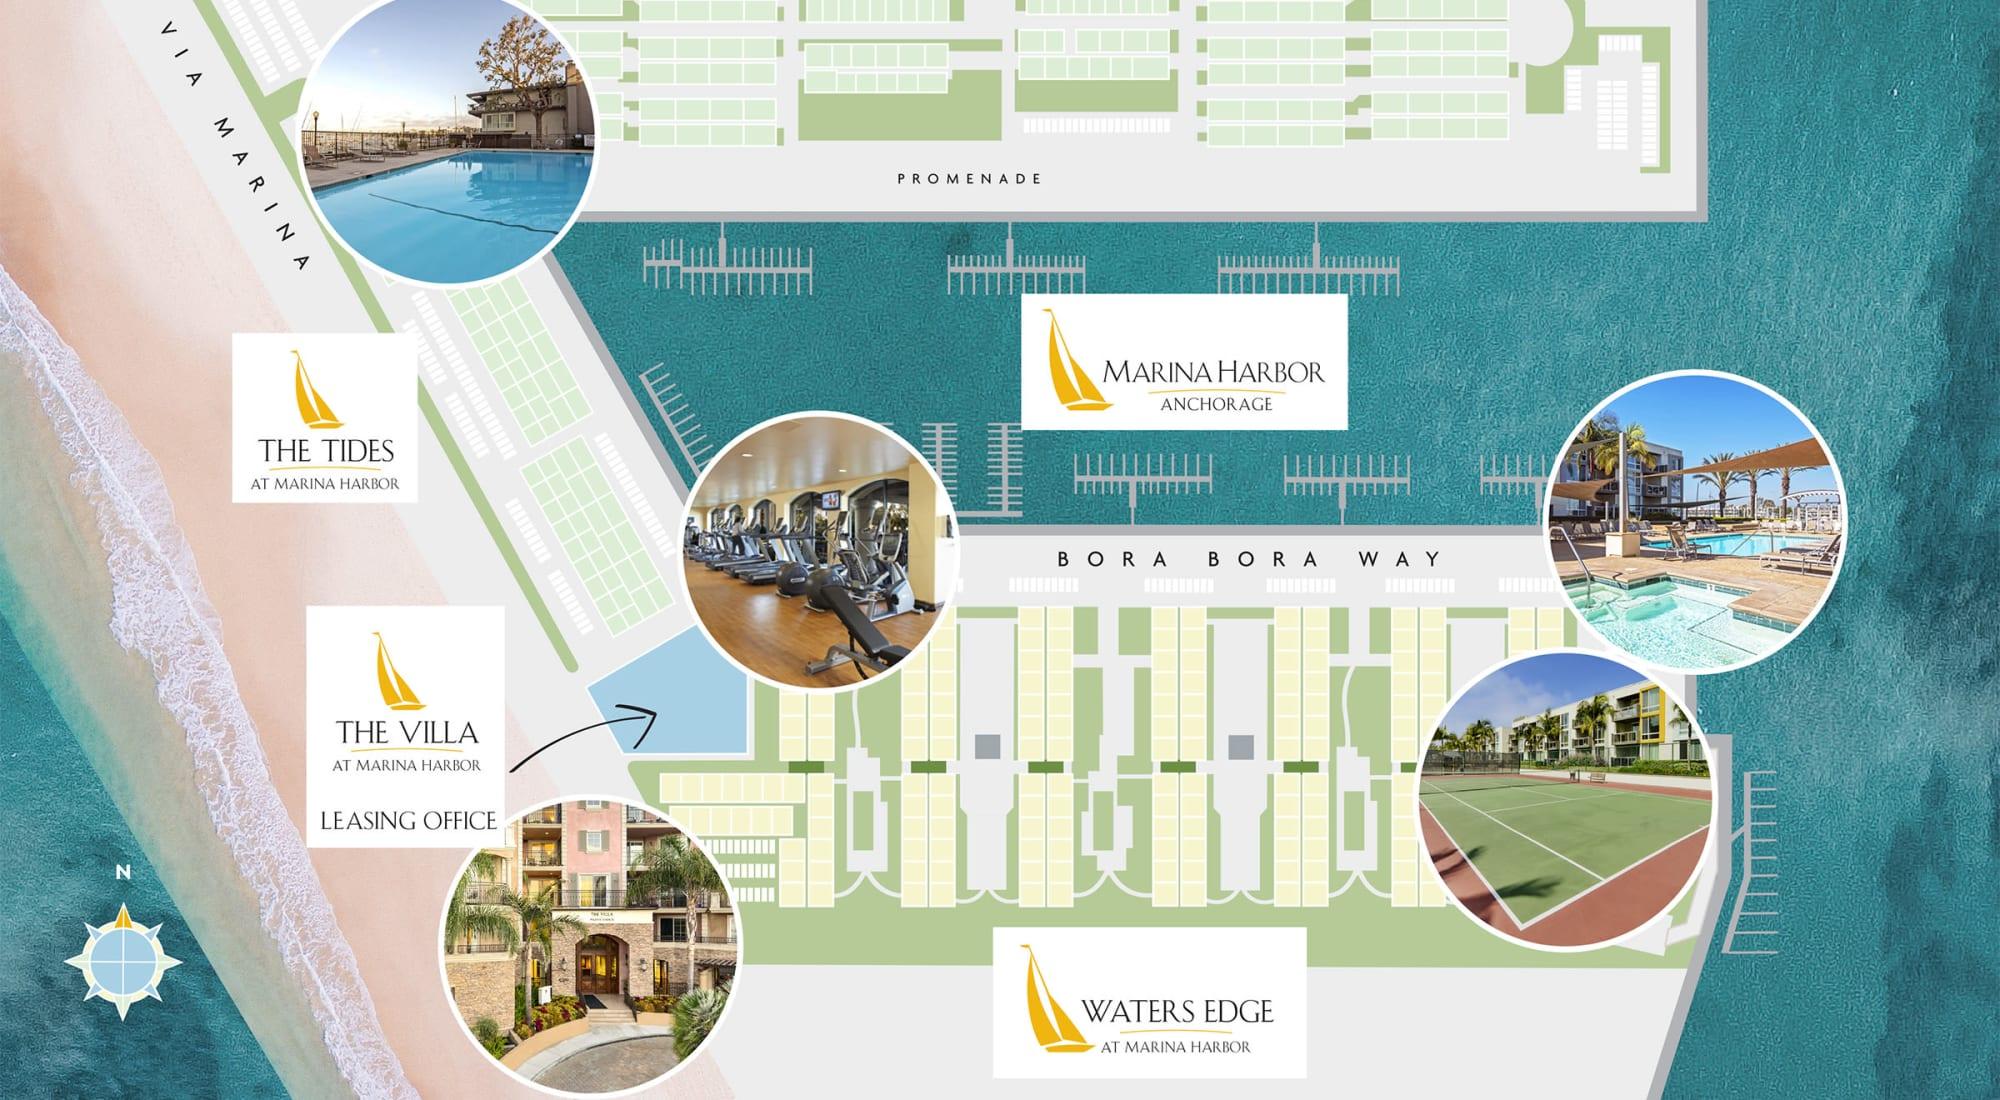 Overall neighborhood site plan for The Villa at Marina Harbor in Marina del Rey, California